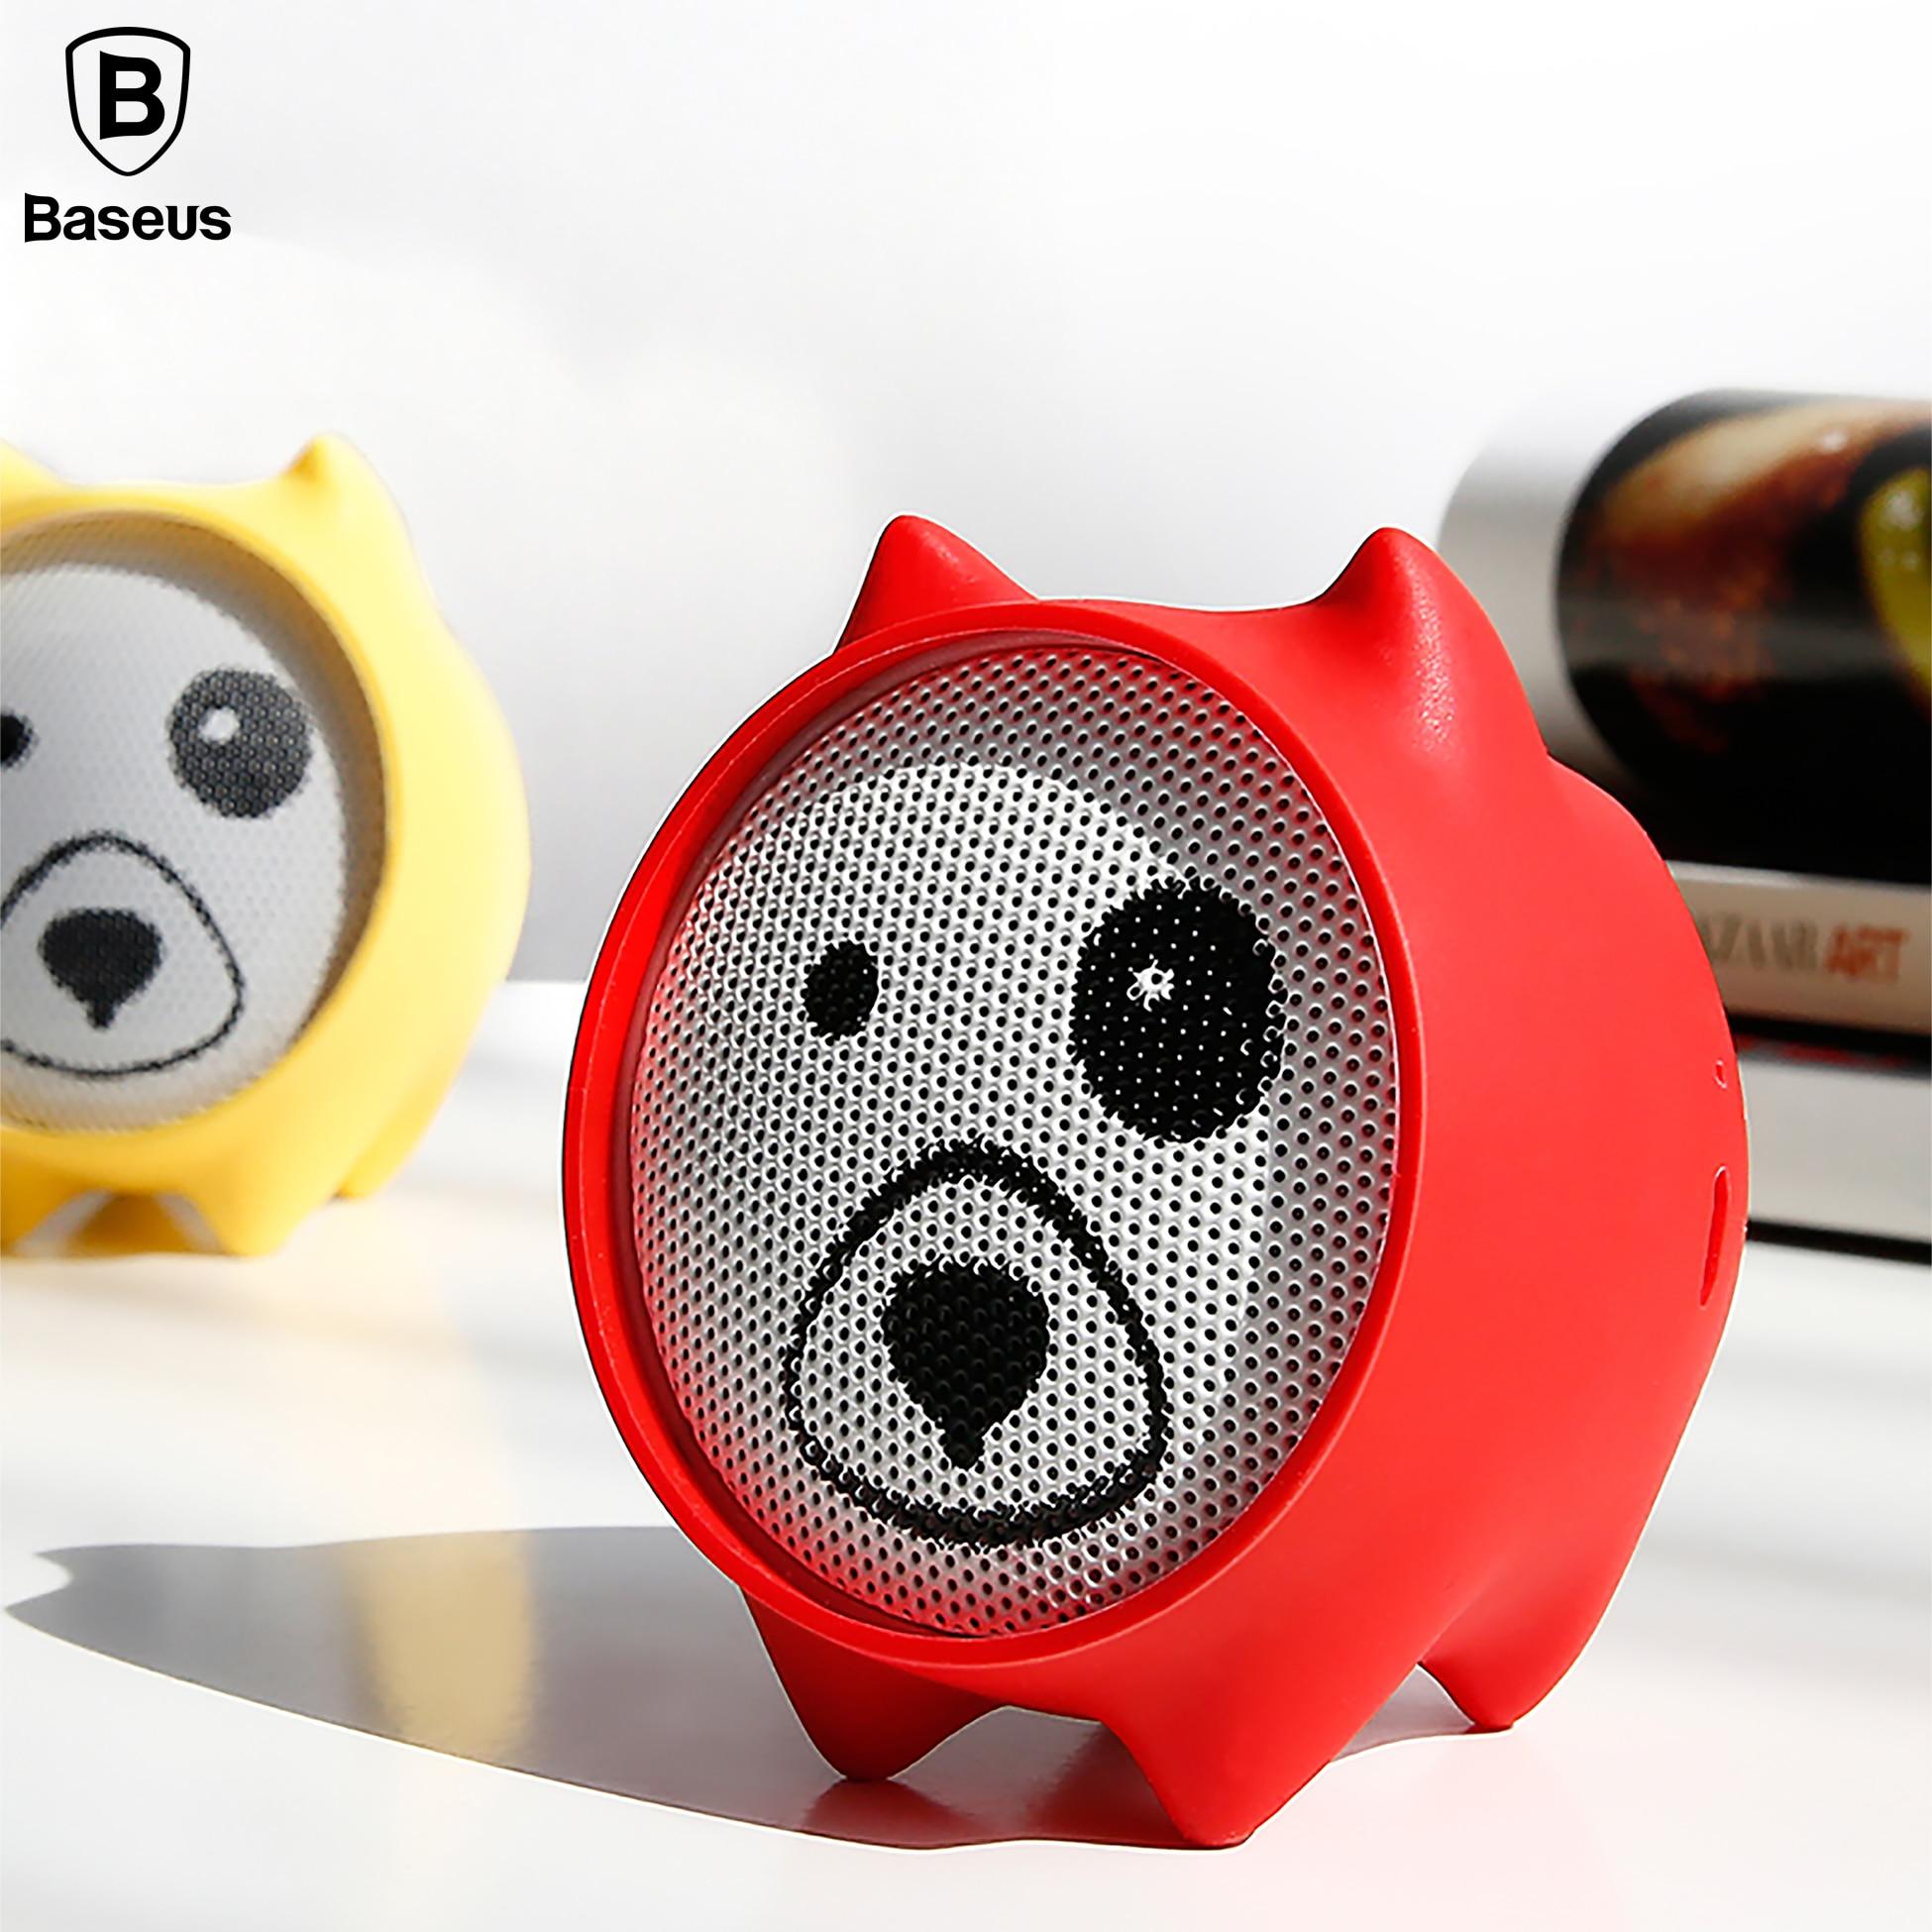 Baseus Dogz Portable Bluetooth Wireless Speaker Stereo Sound Mini Outdoor Speaker MP3 Music Play Loudspeaker For Phone Laptop